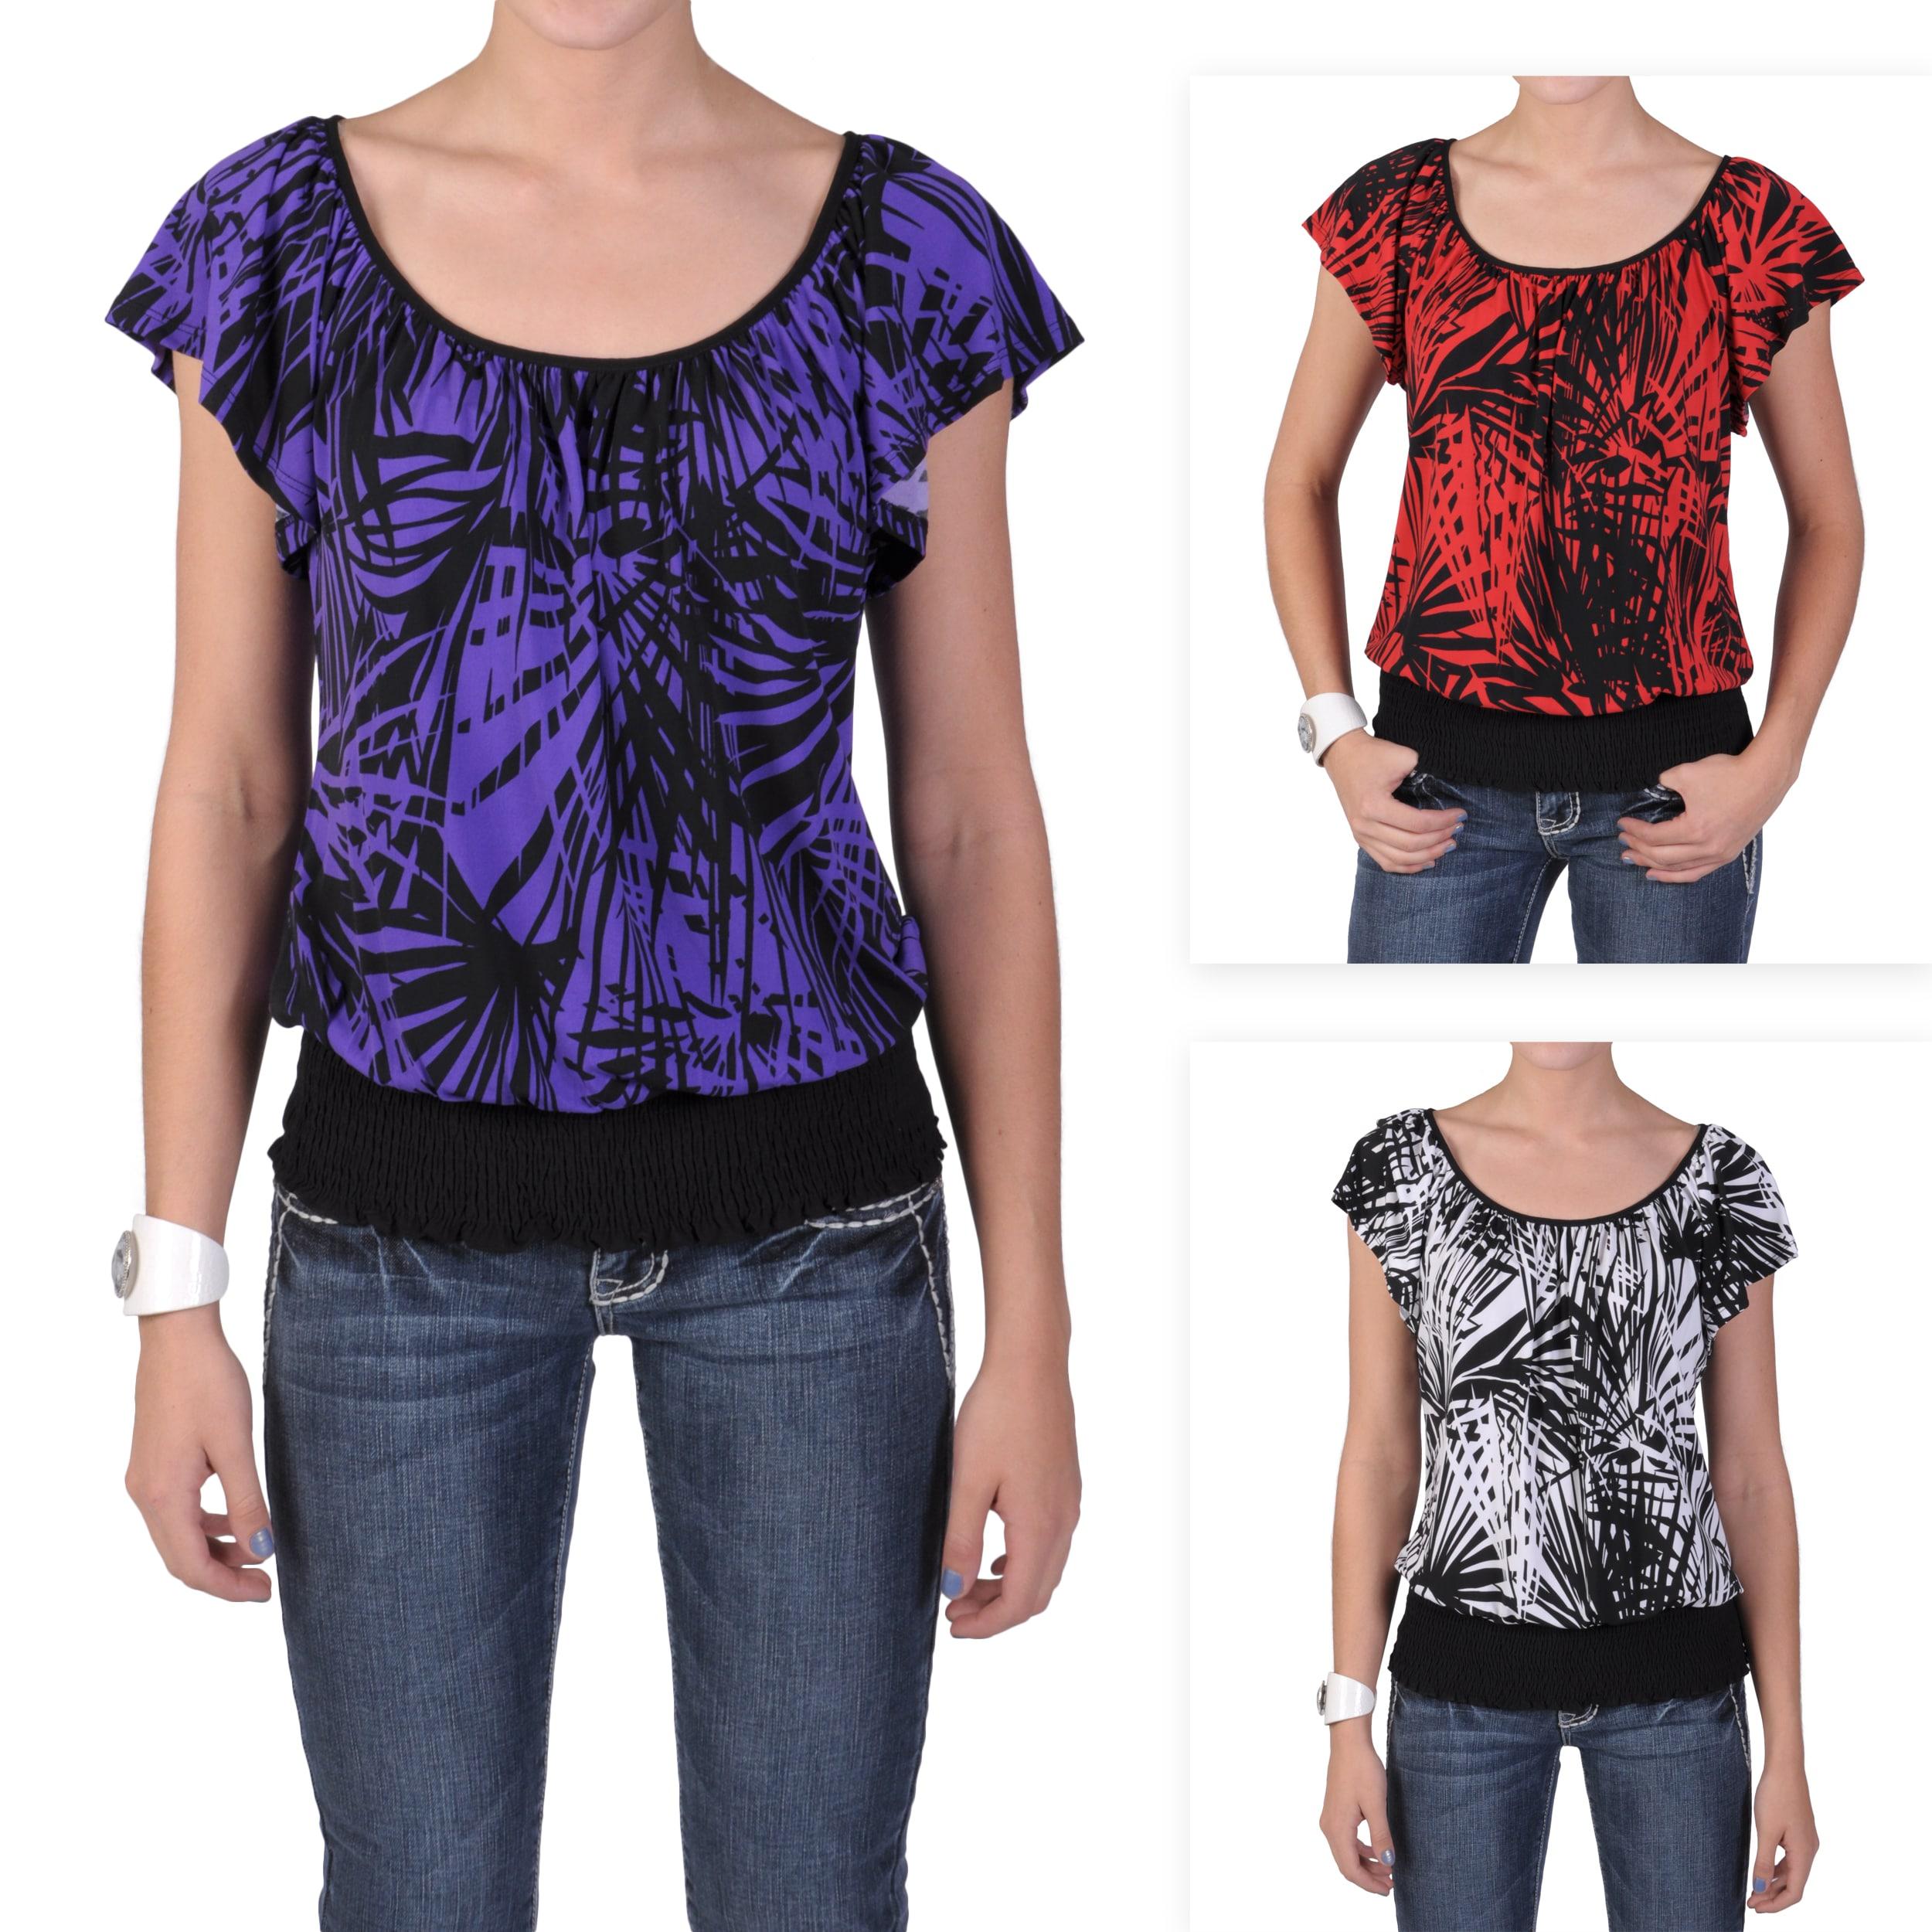 Tressa Designs Women's Contemporary Plus Short-sleeve Smocked Top